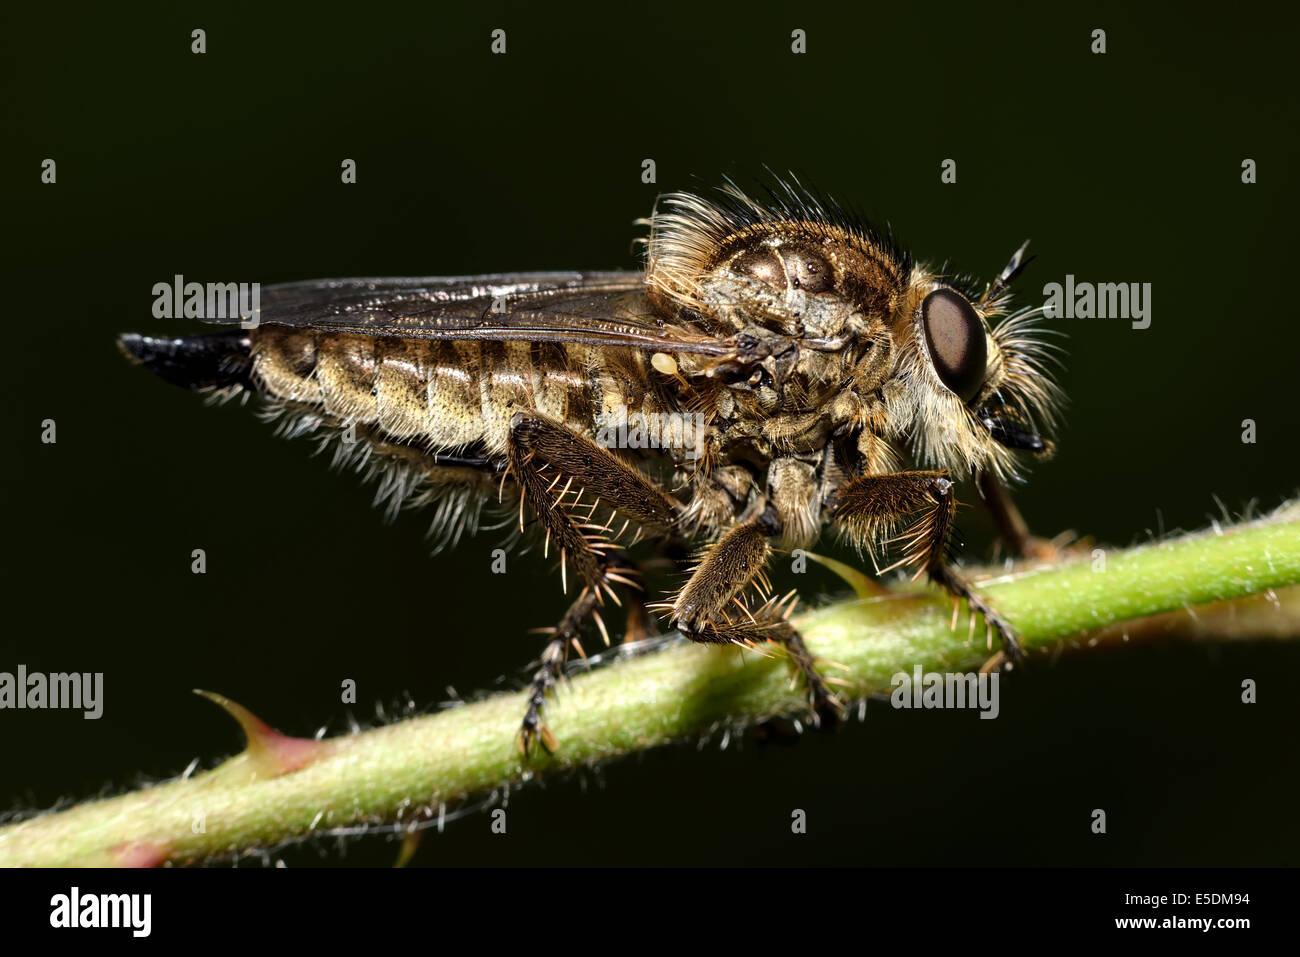 Common Awl Robberfly, Neoitamus cyanurus, sitting on stem in front of black background - Stock Image